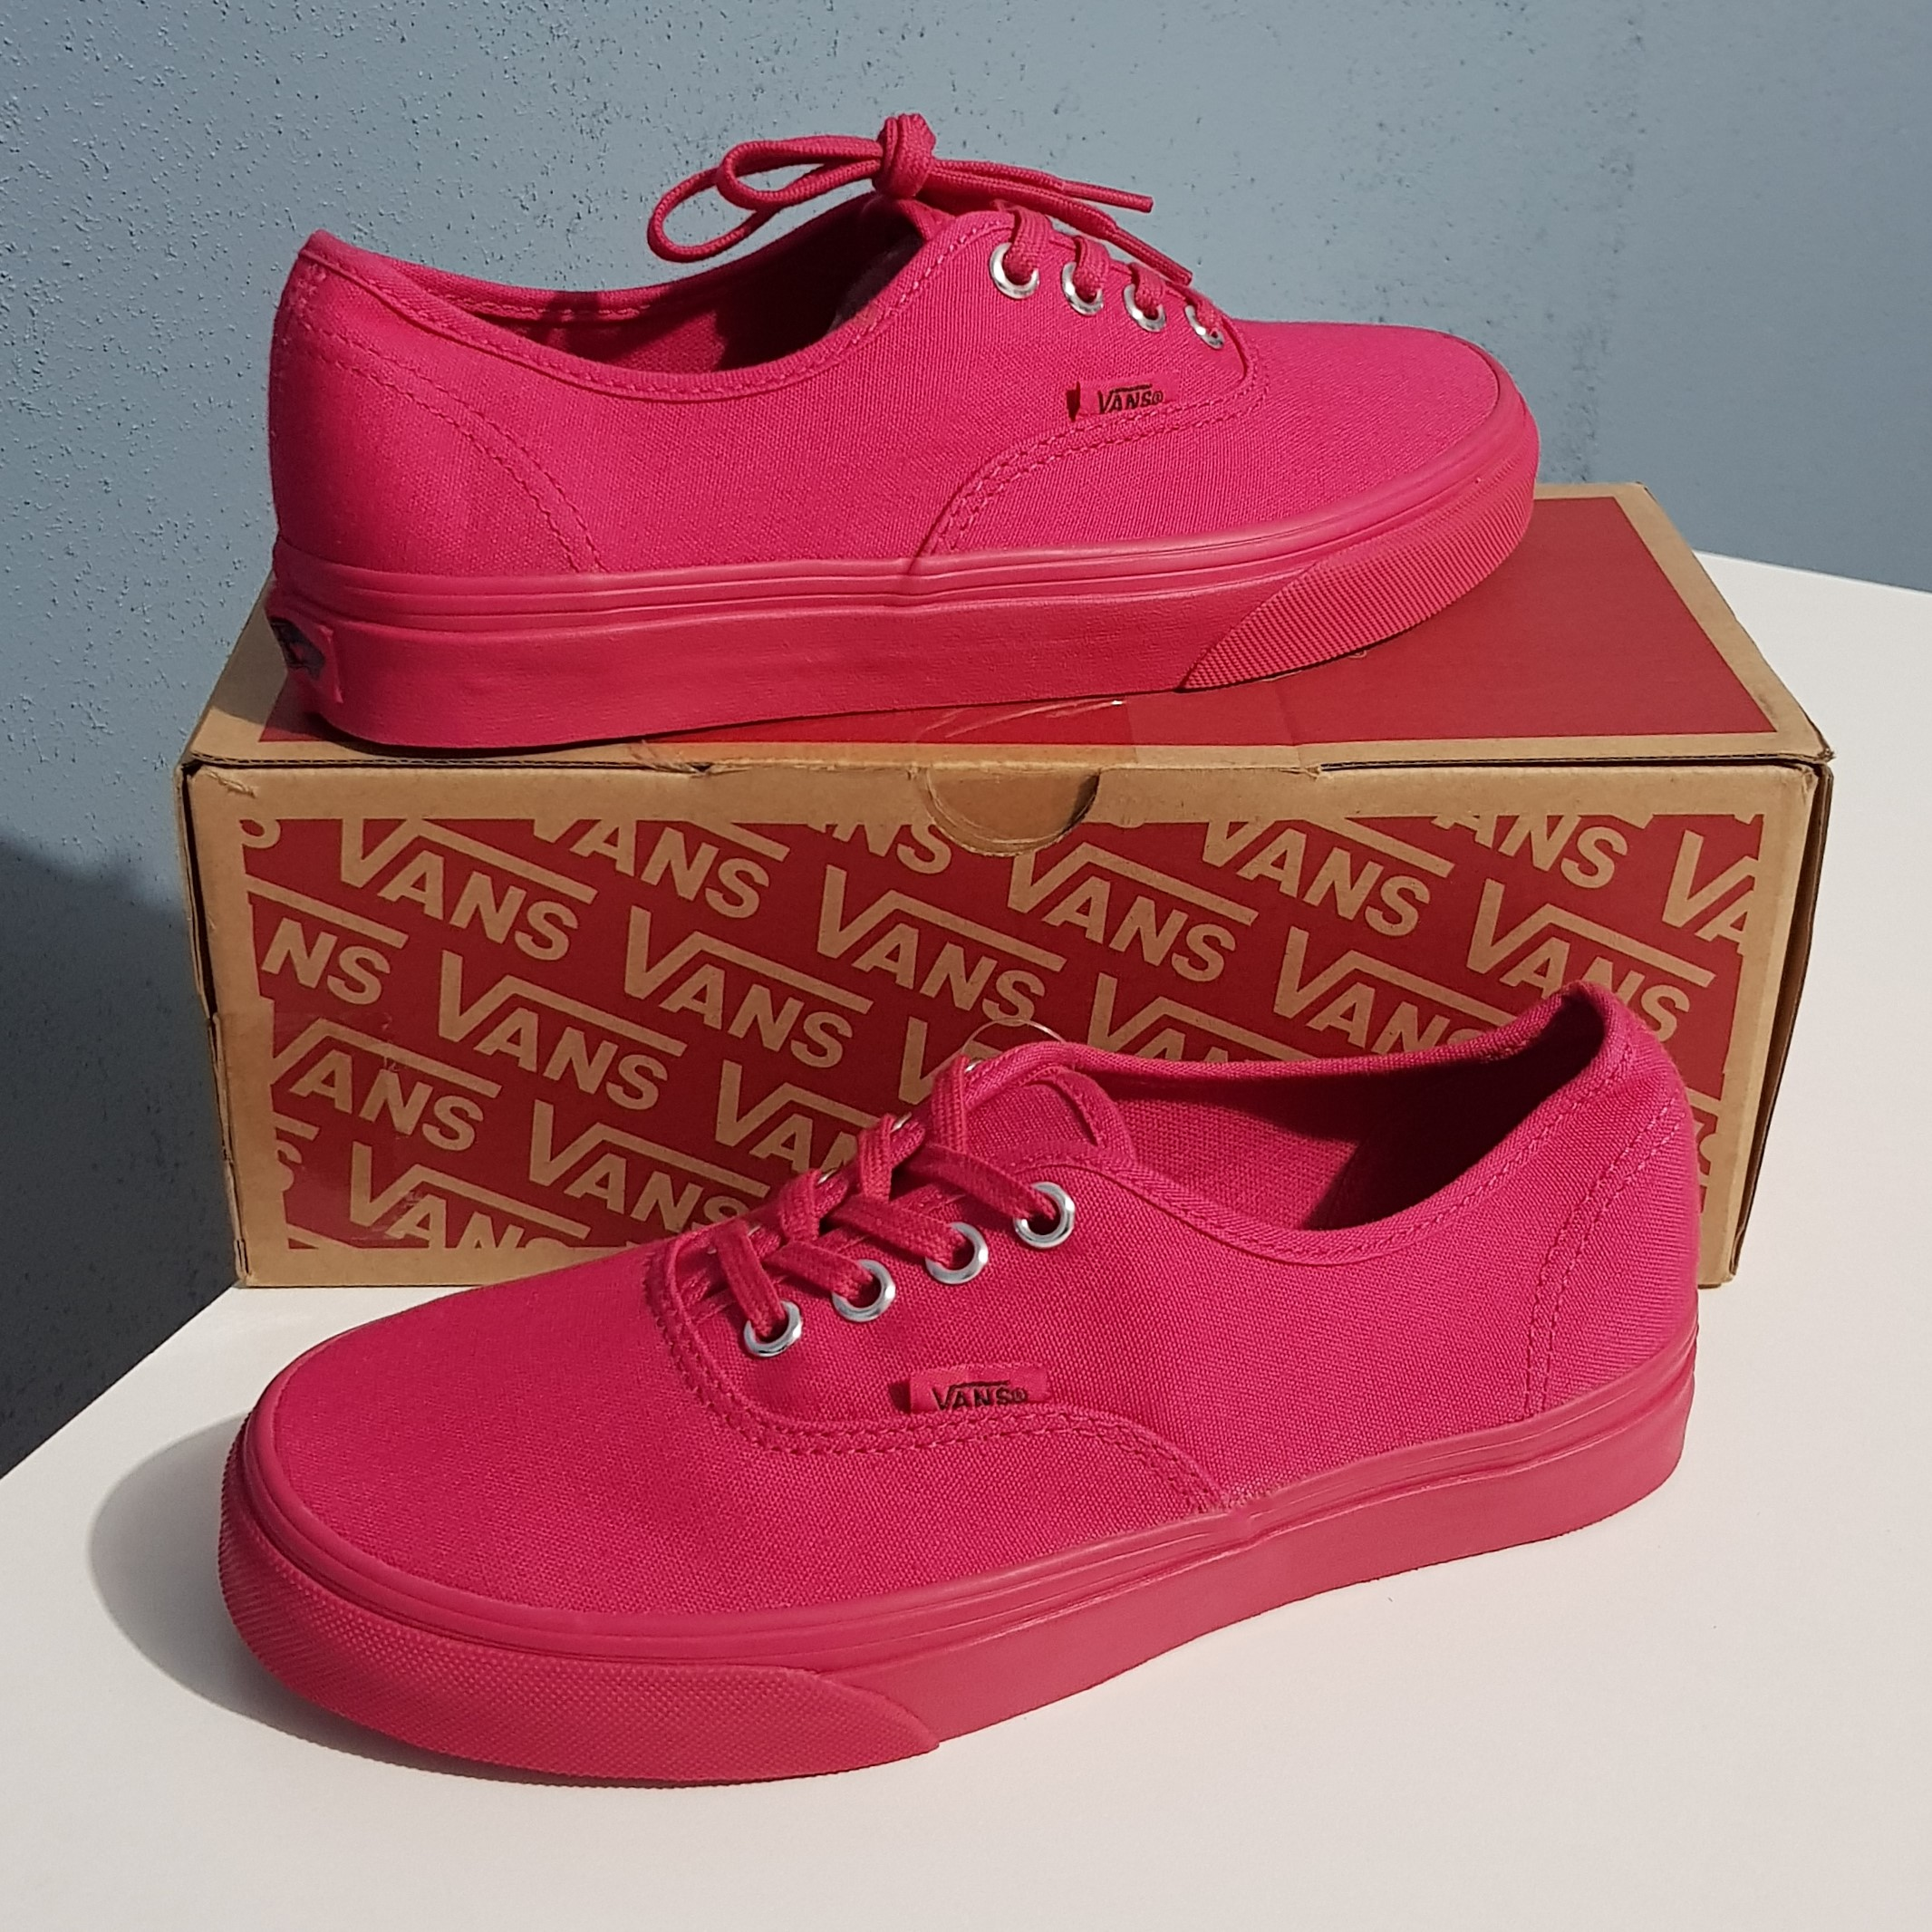 VANS Mono Women's Shoes / Red